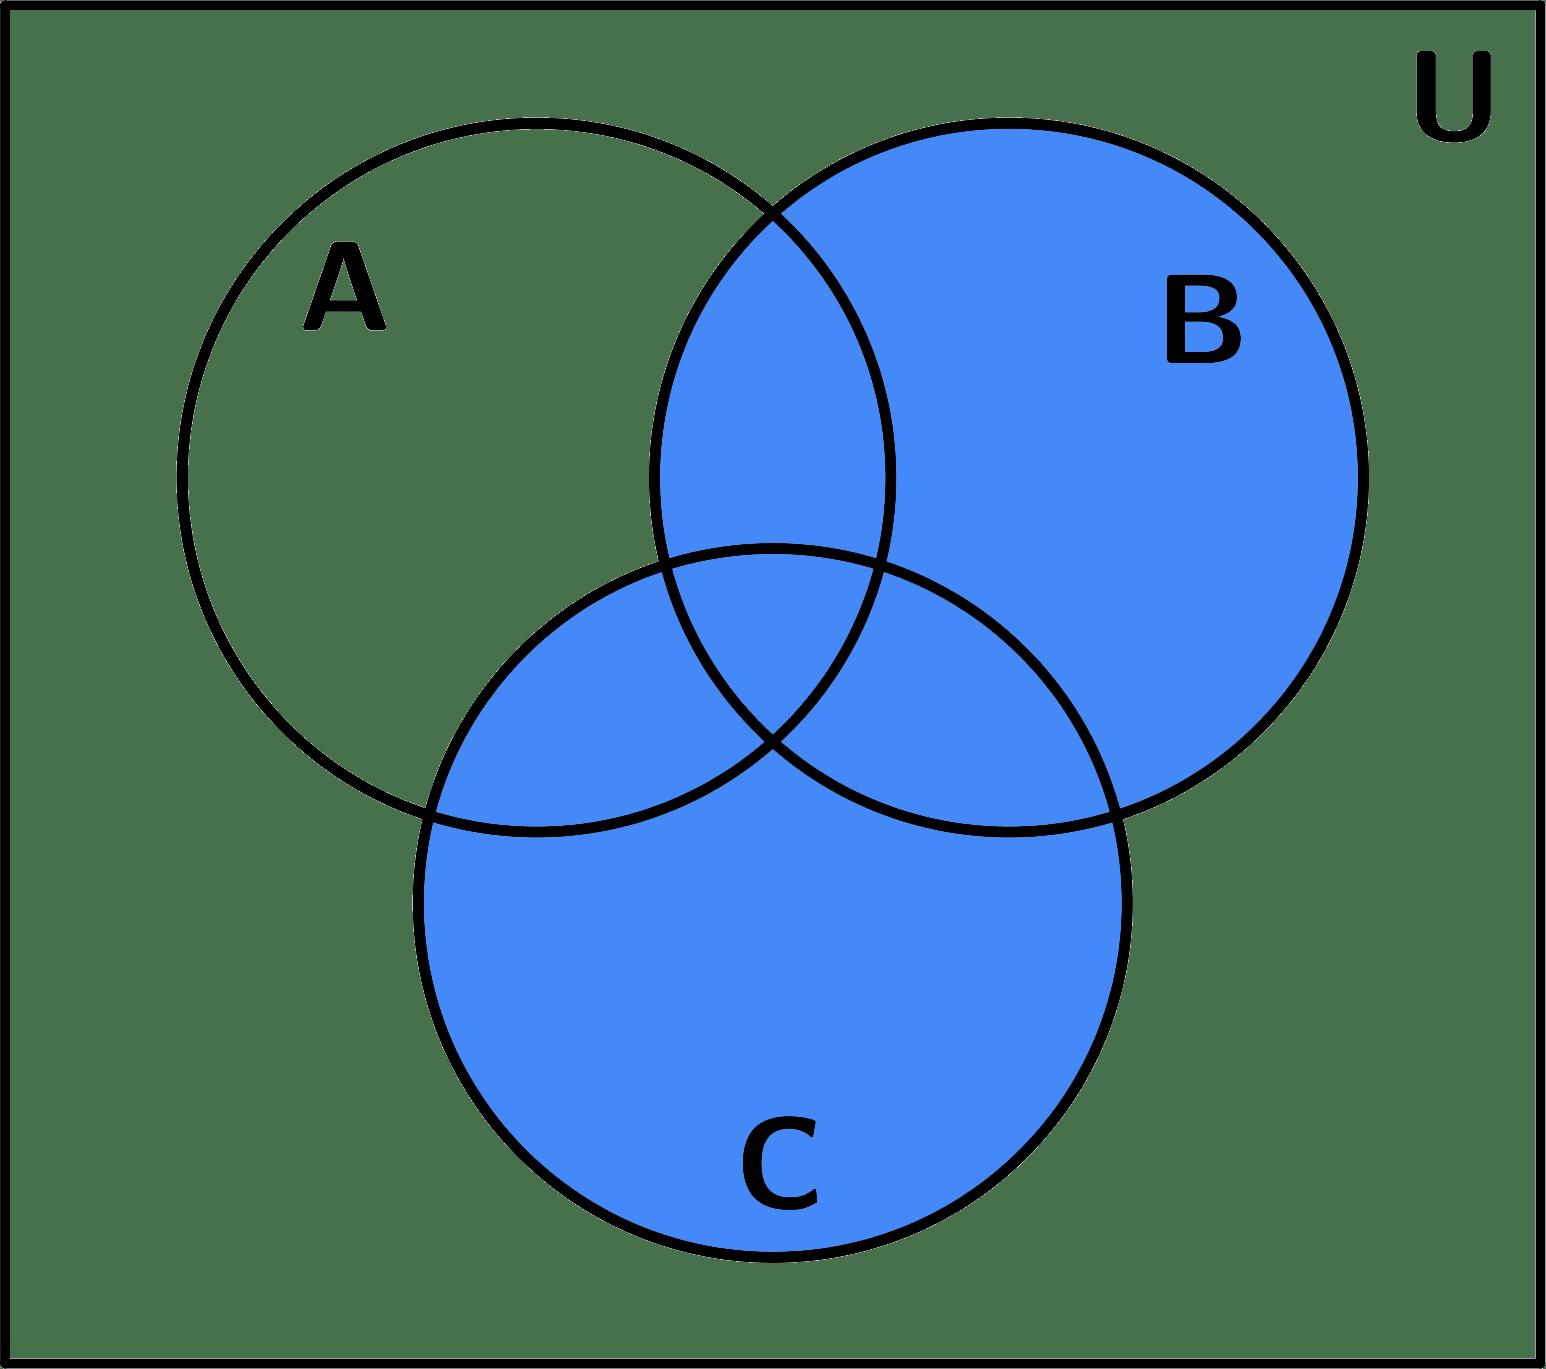 a union b c venn diagram shower drain vent diagramas de ejercicios resueltos